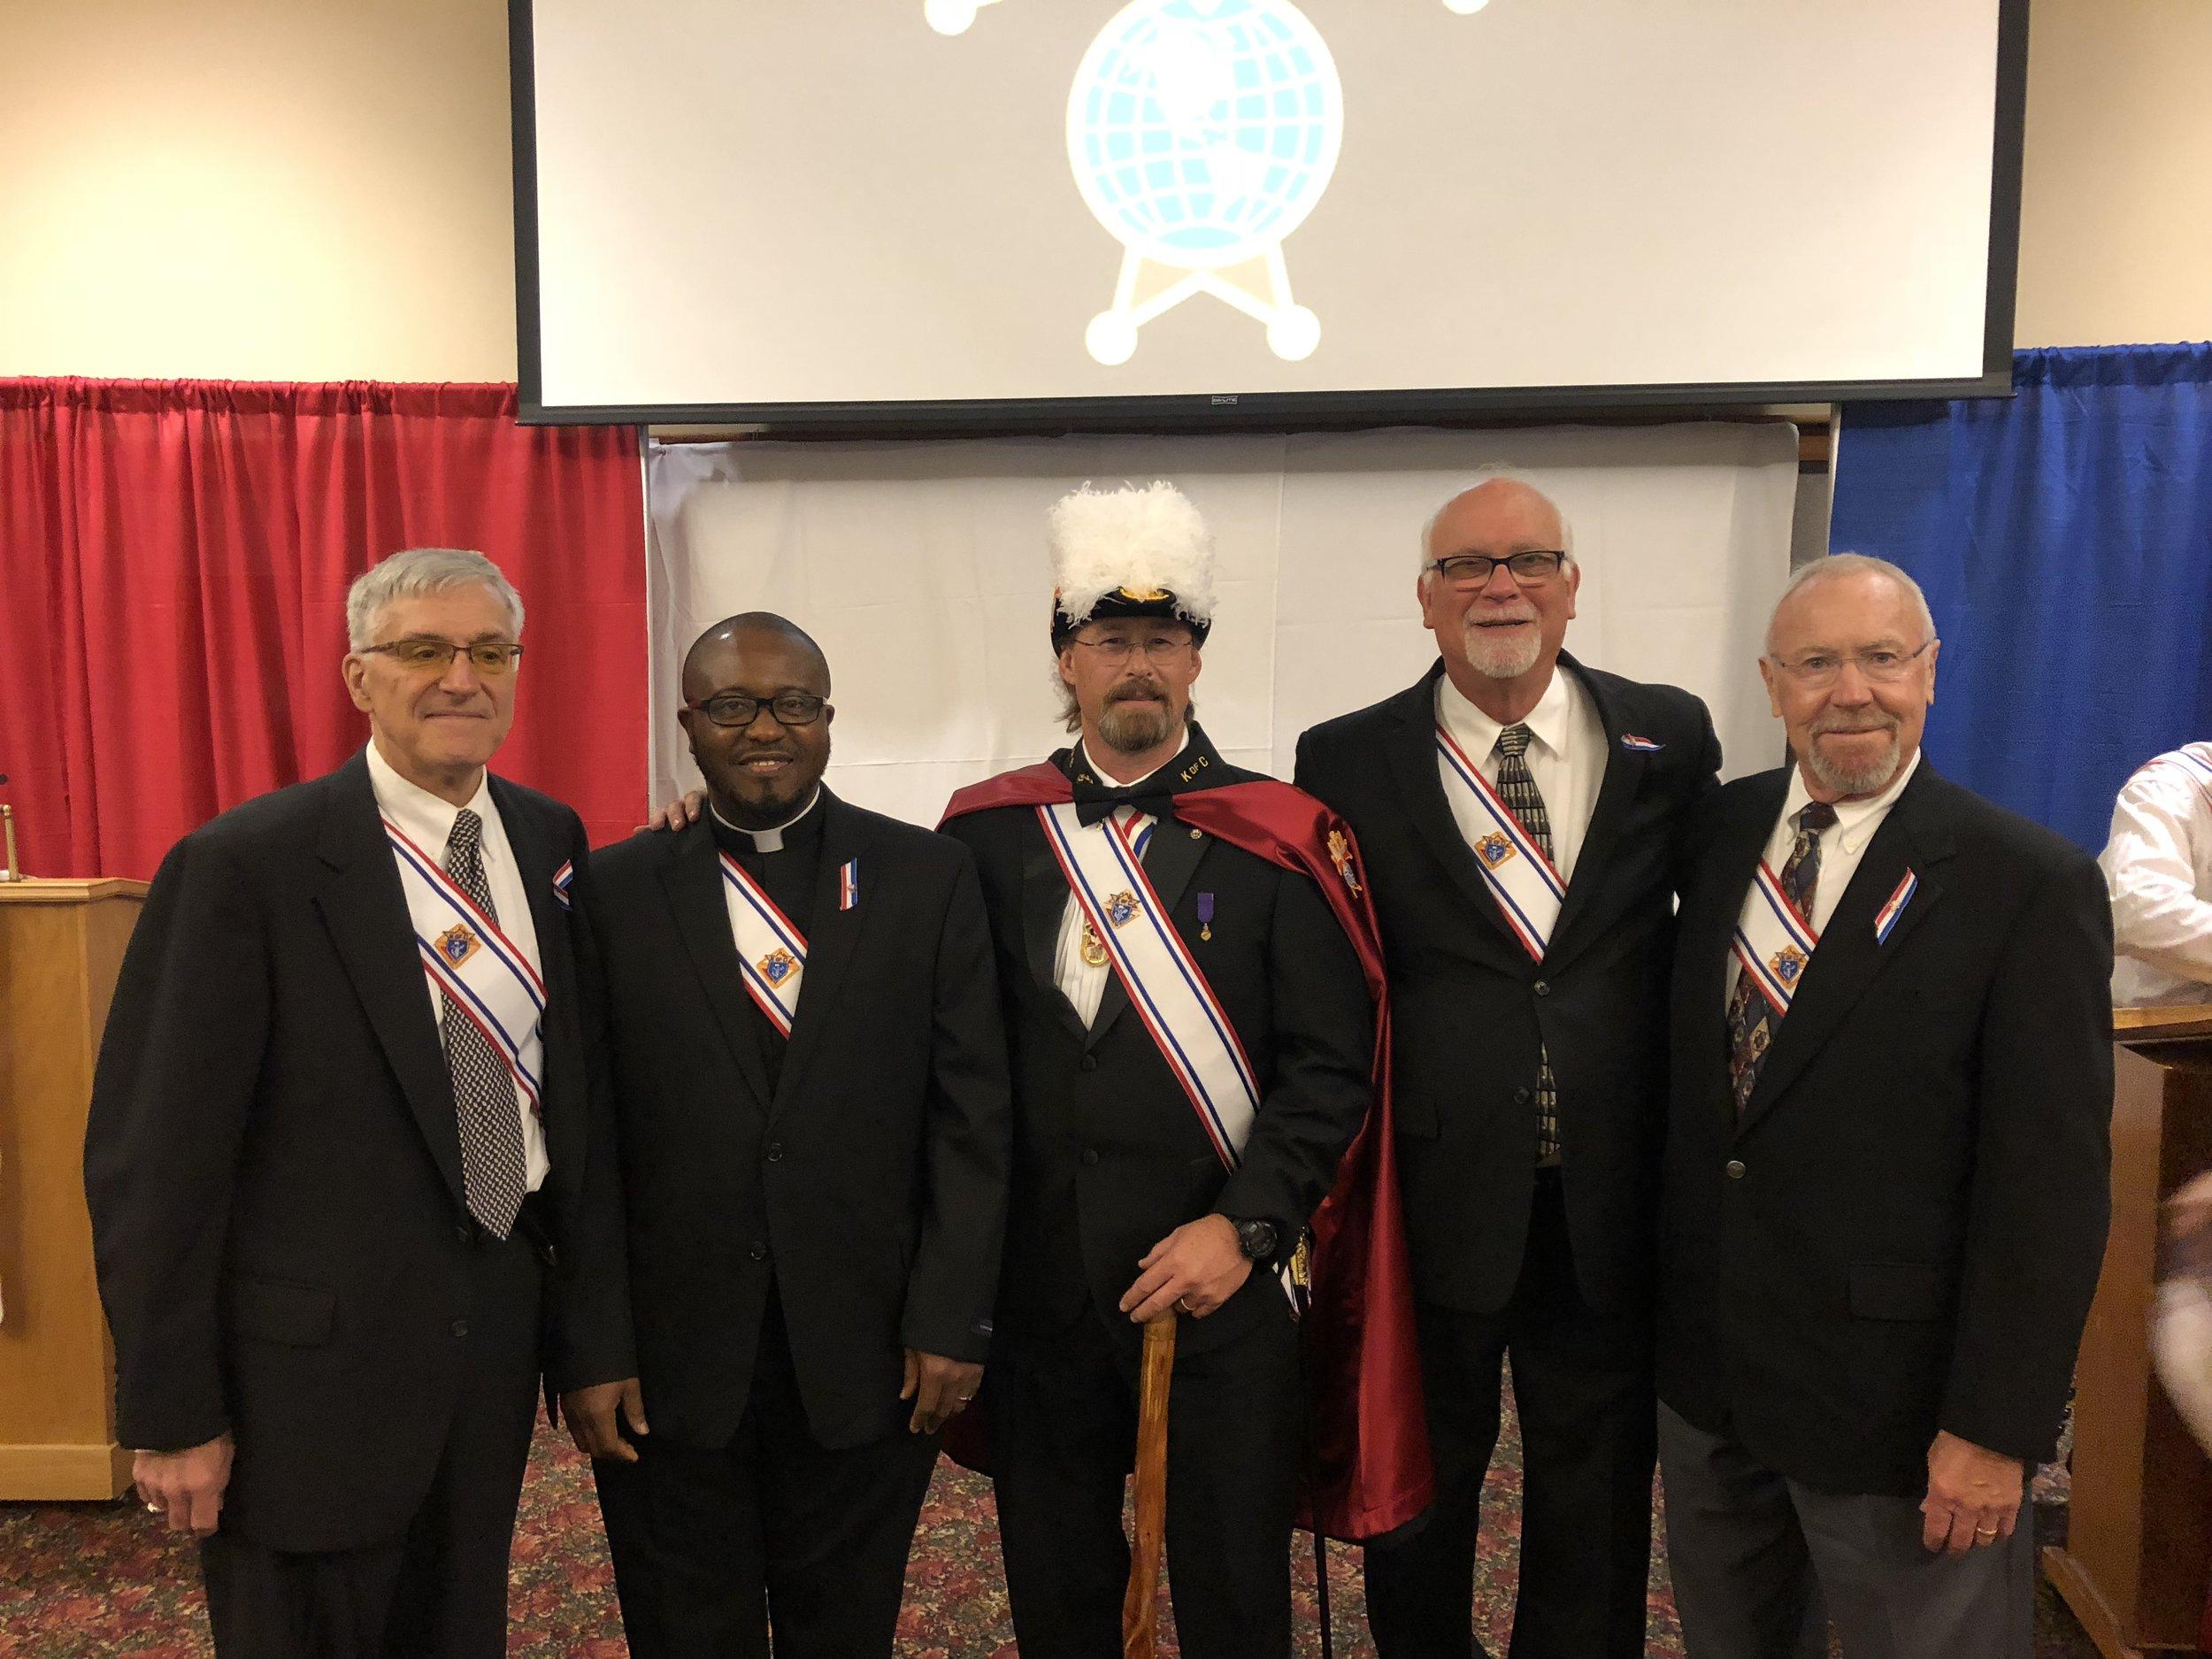 Mike Casanova, Father Bruno Nwachukwu, 4th Degree member Steven W. NaSalle, David Steehler, Bill John